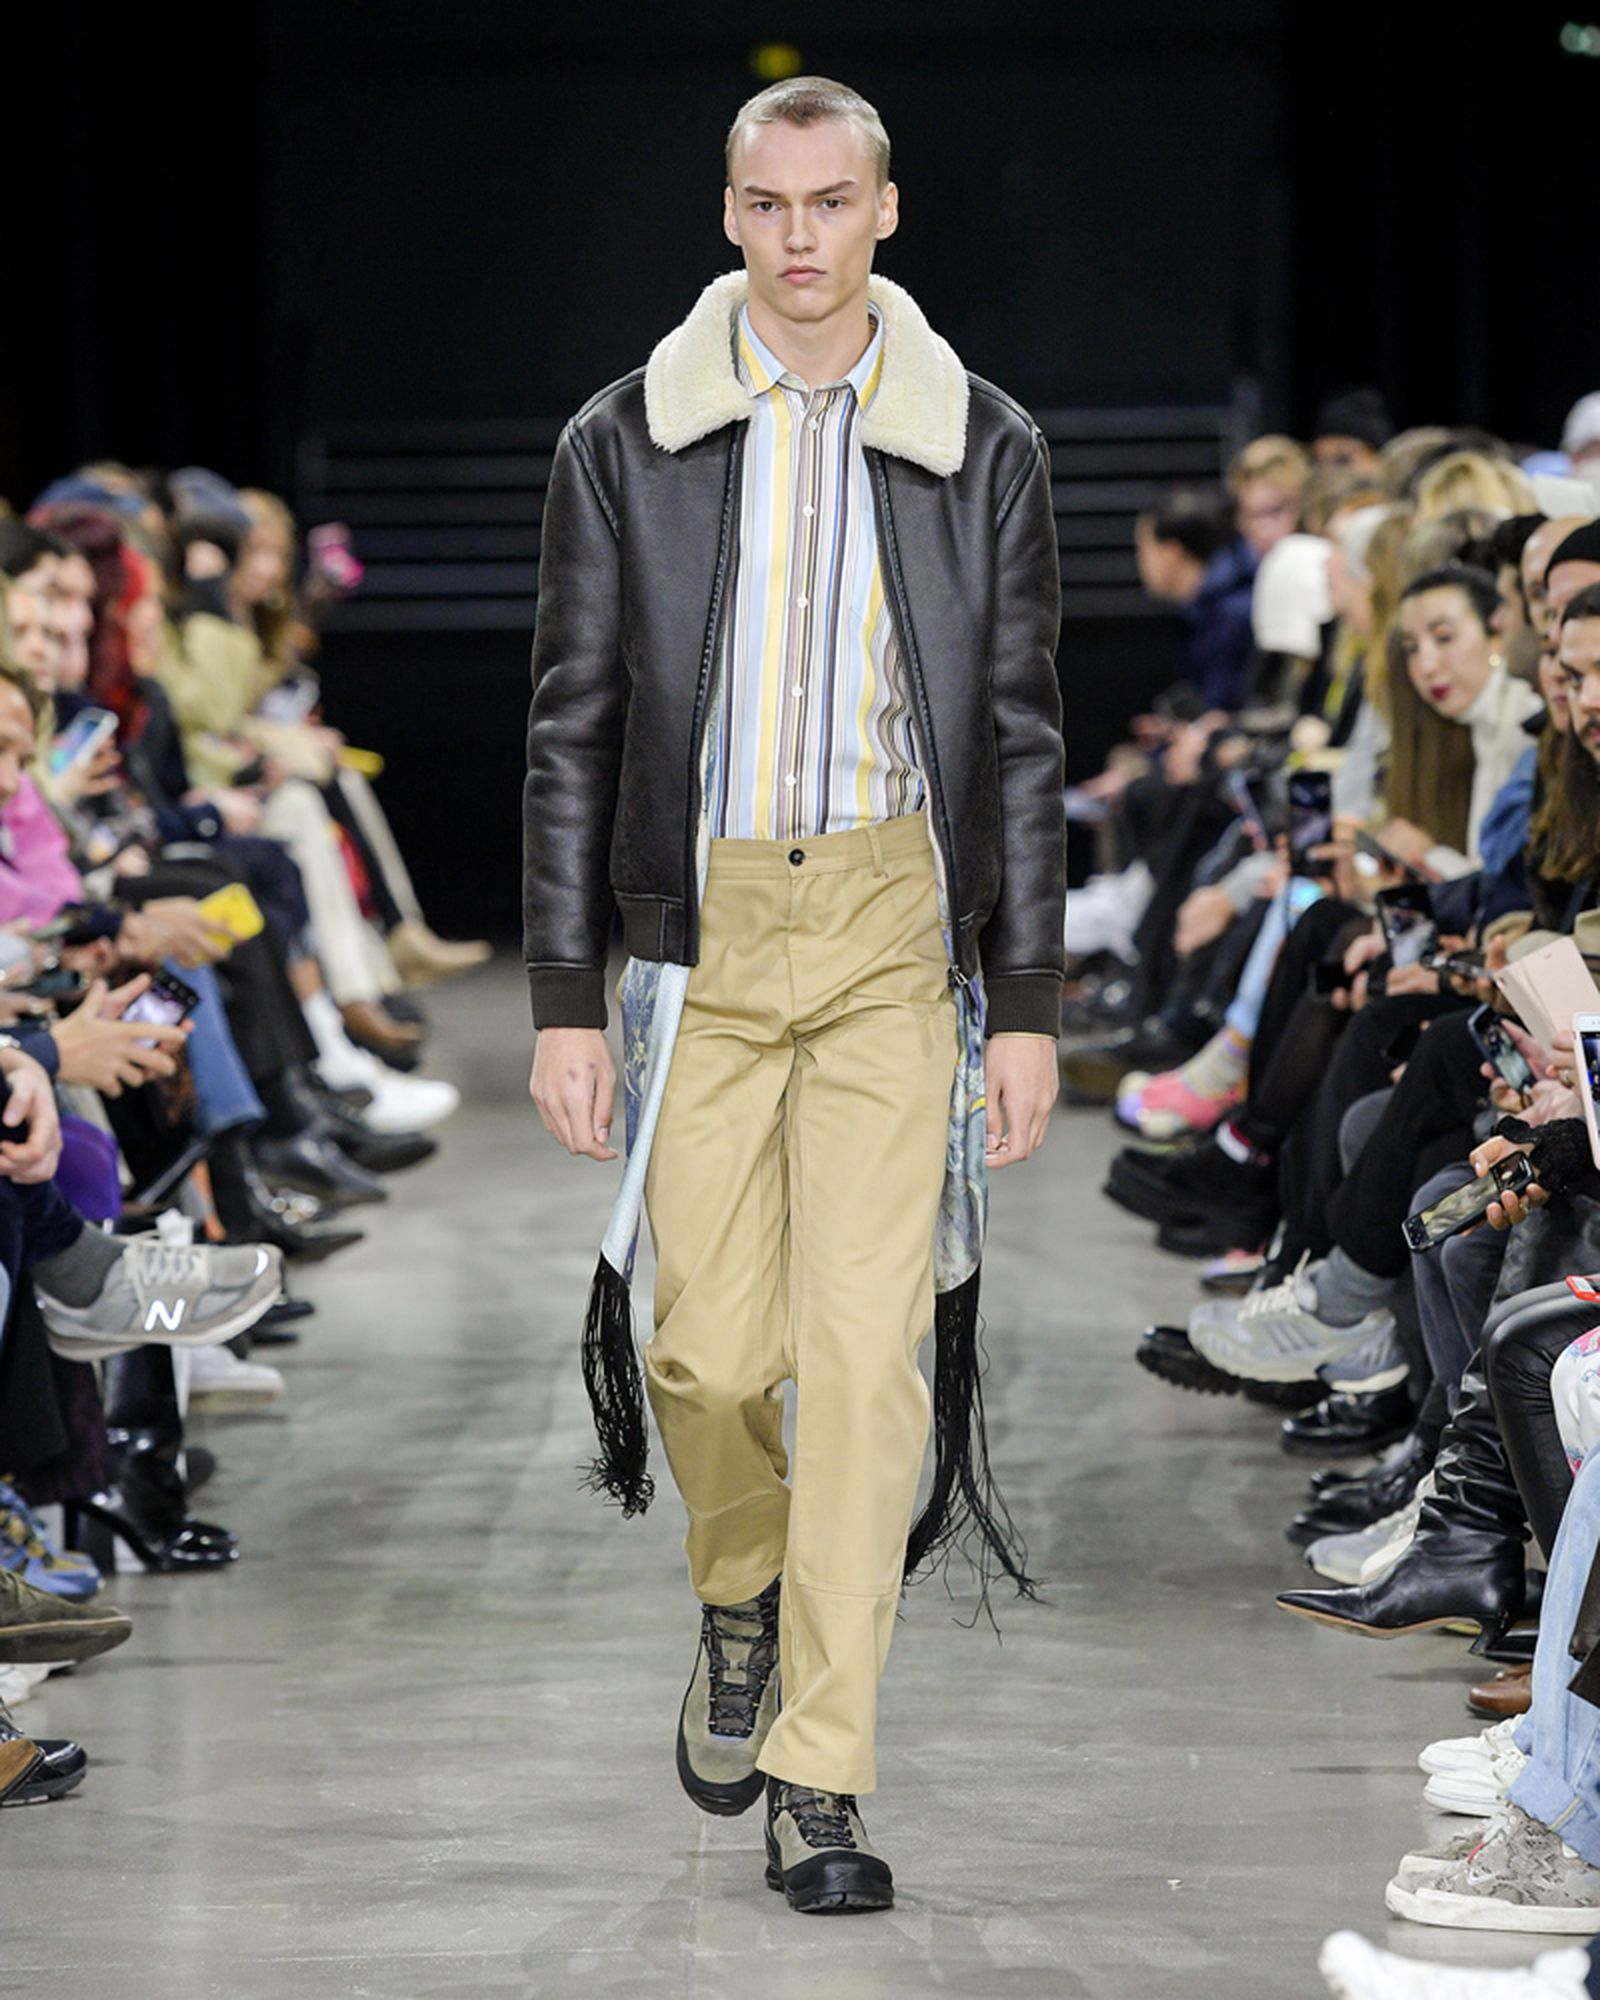 future-fashion-week-copenhagen-soulland-5